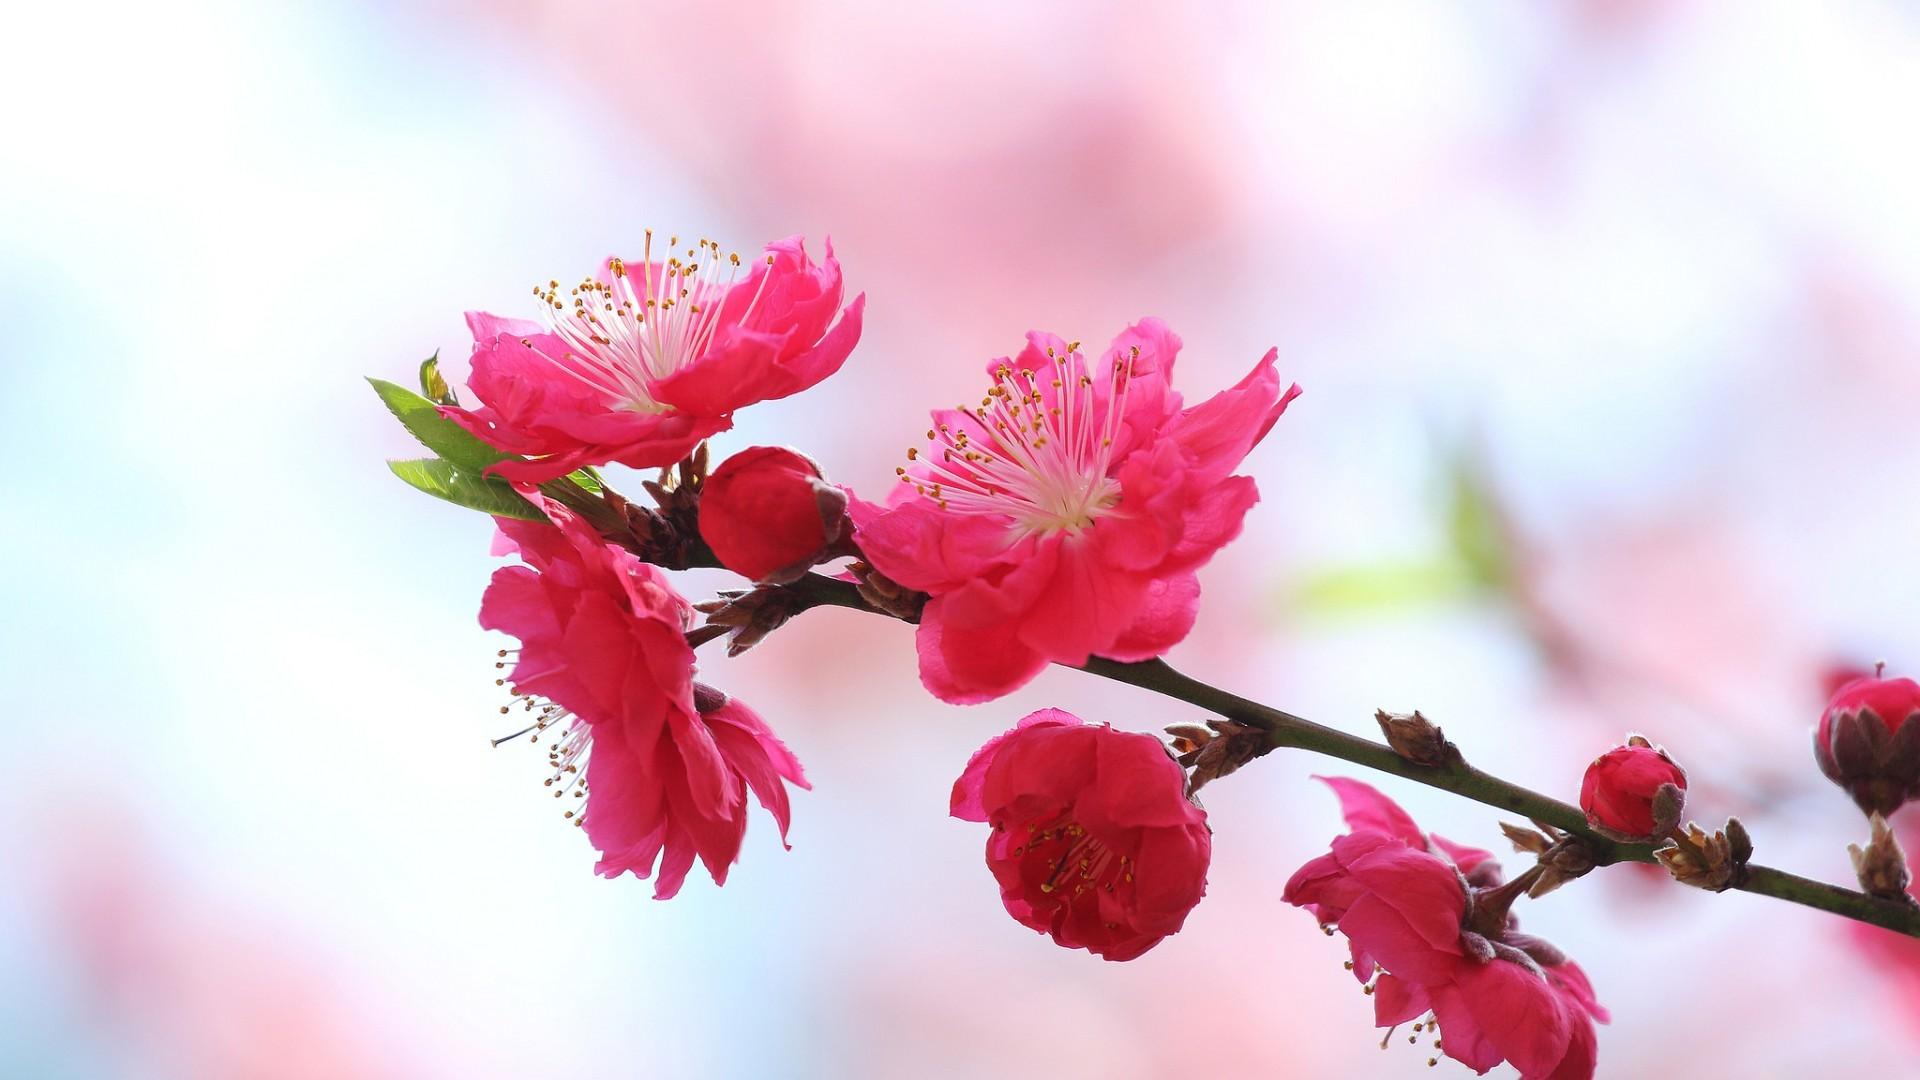 red cherry blossom bloom branch in spring morning hd